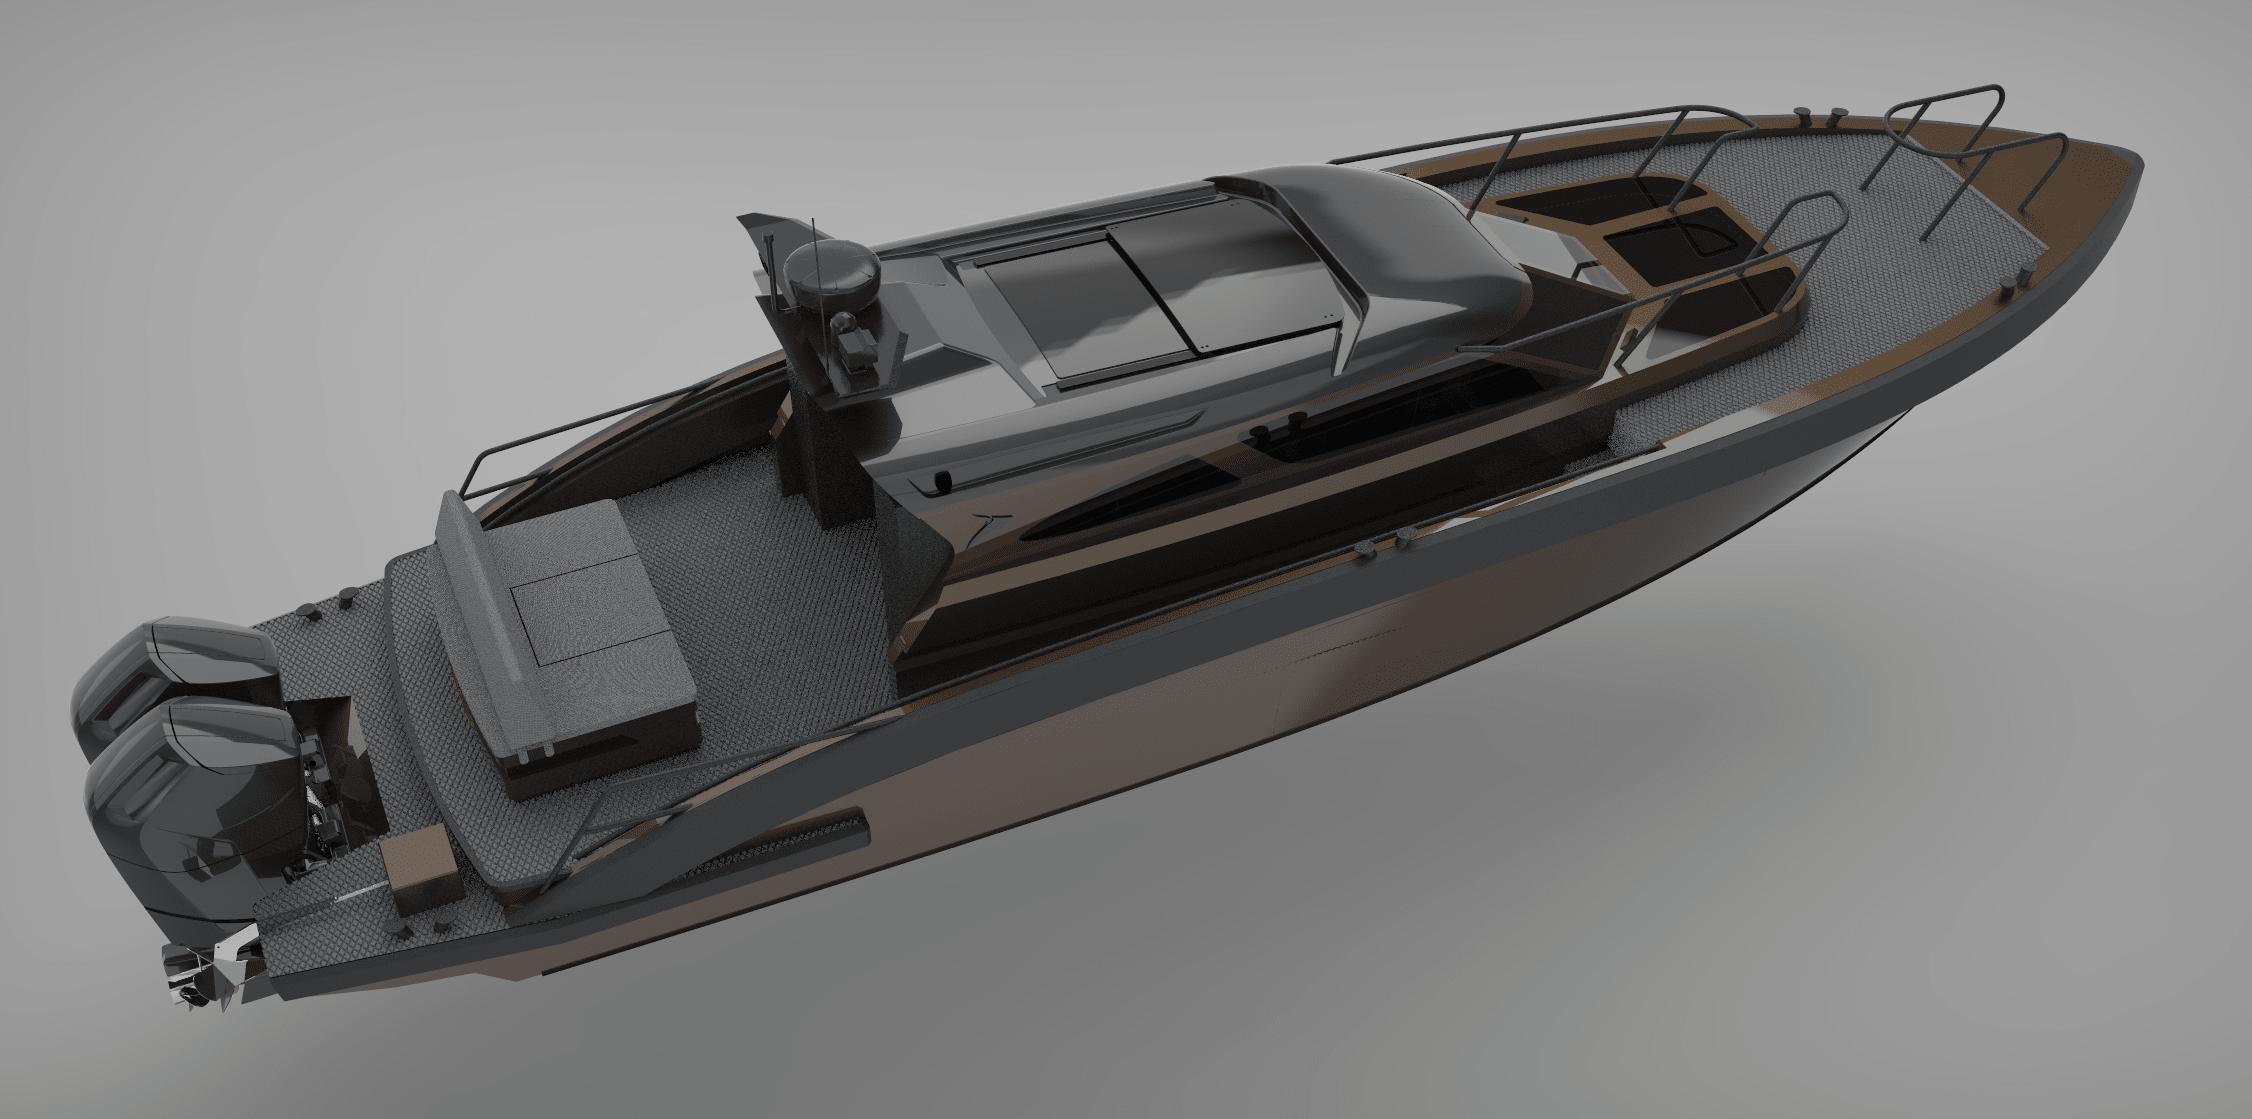 M12 custom rendered boat model